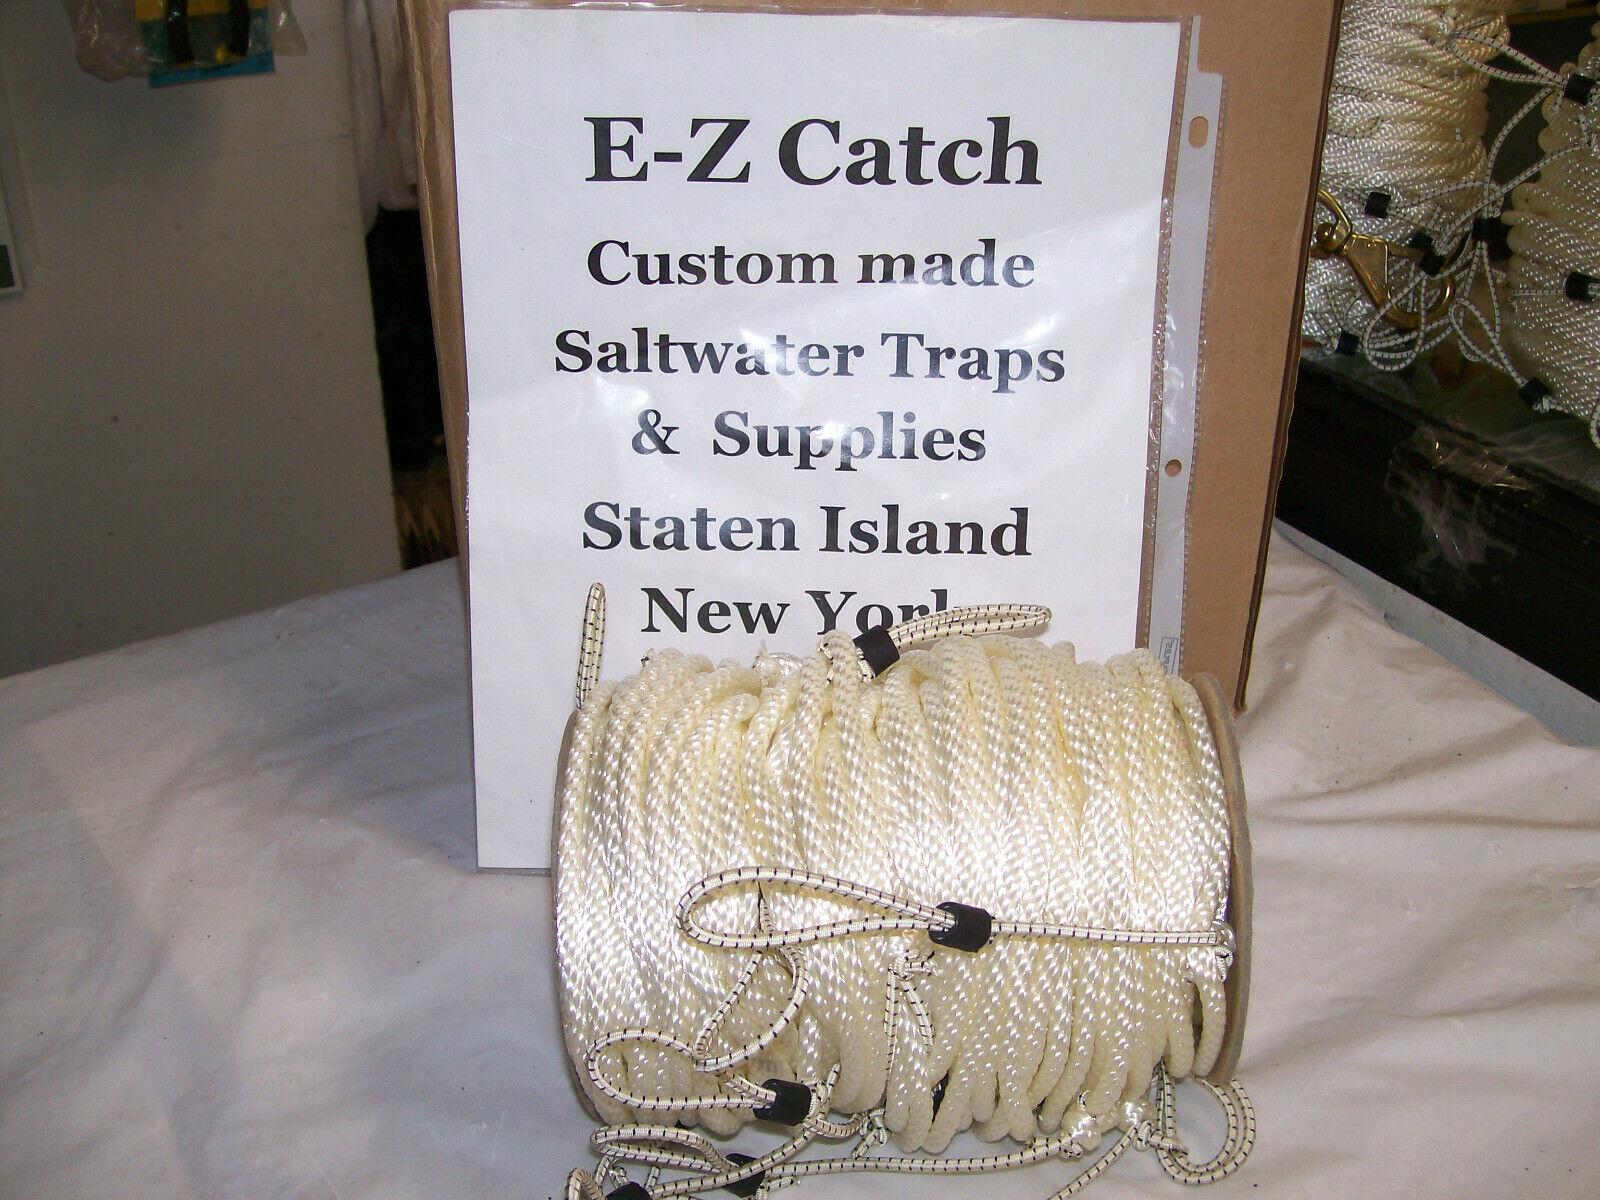 New Jersey Legal 1  4  Medium-Lay Snood Crab Tredline 150 Foot w  25 Snoods  best quality best price